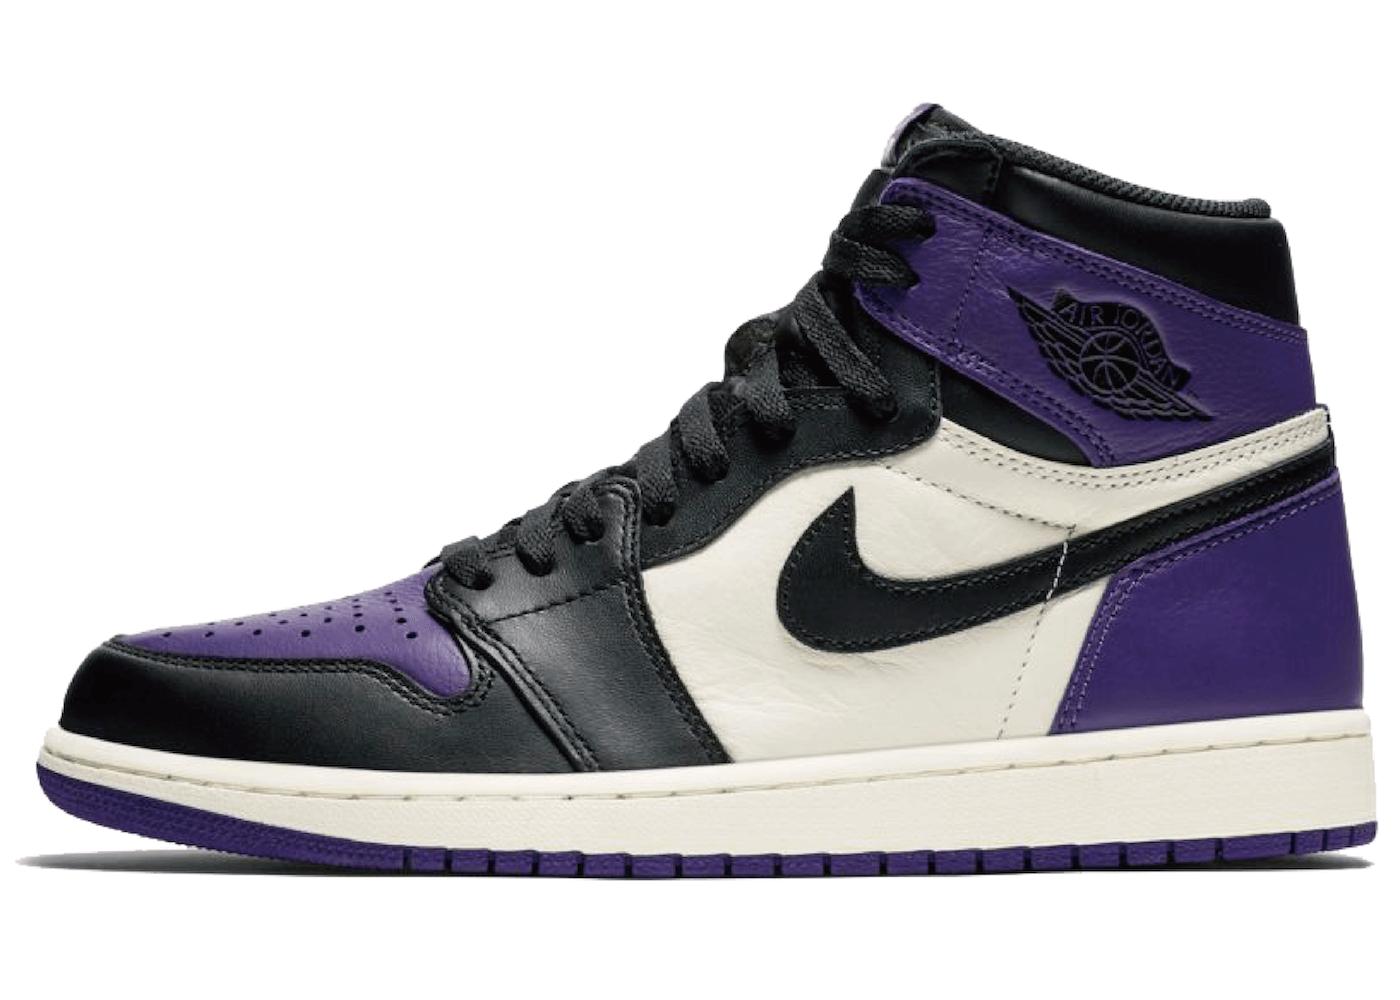 Nike Air Jordan 1 Retro High Court Purpleの写真